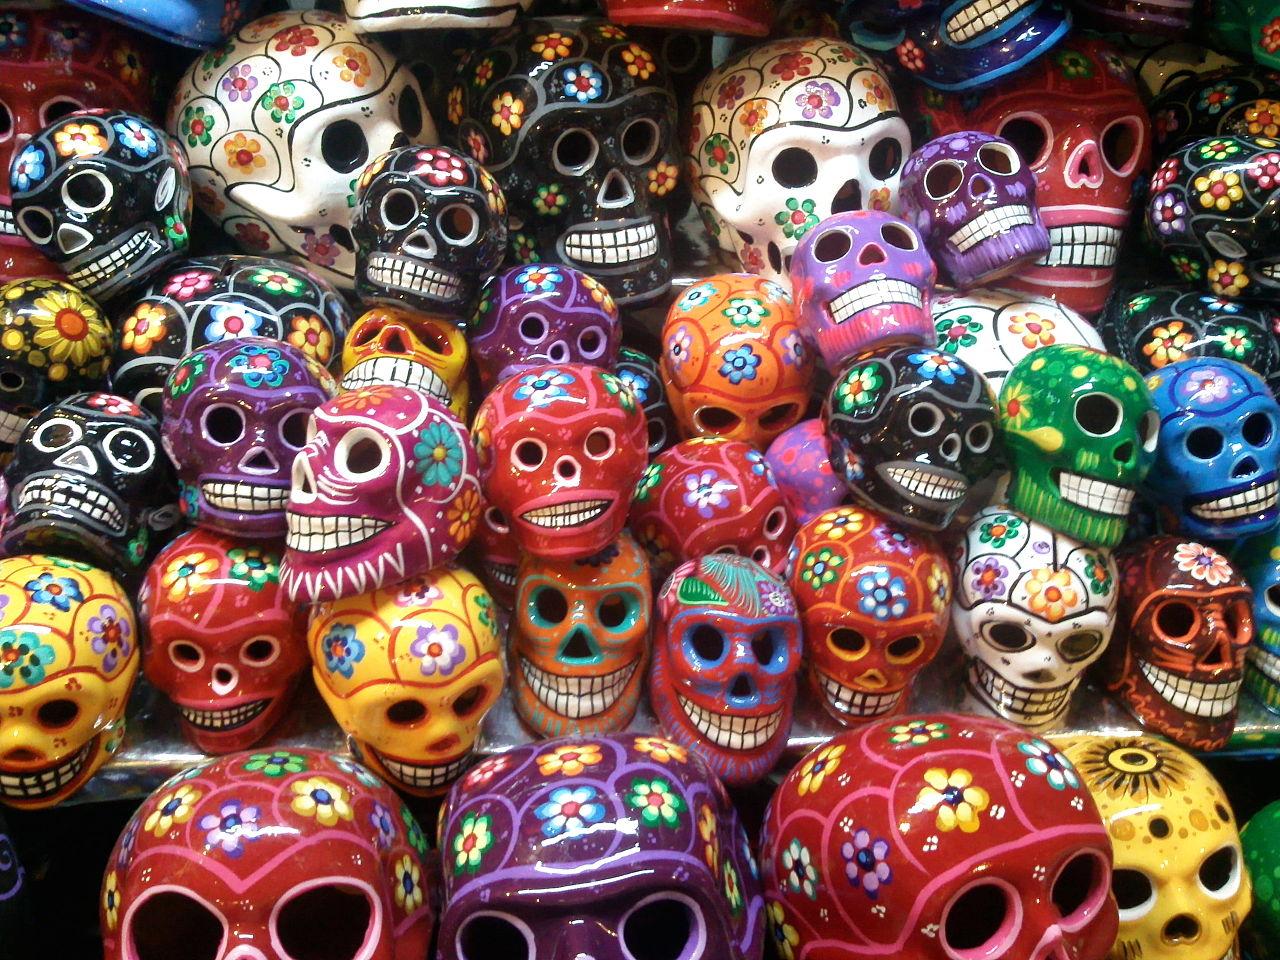 Day of the Dead skulls in the Mercado de Coyoacán | © Guillerminargp/WikiCommons